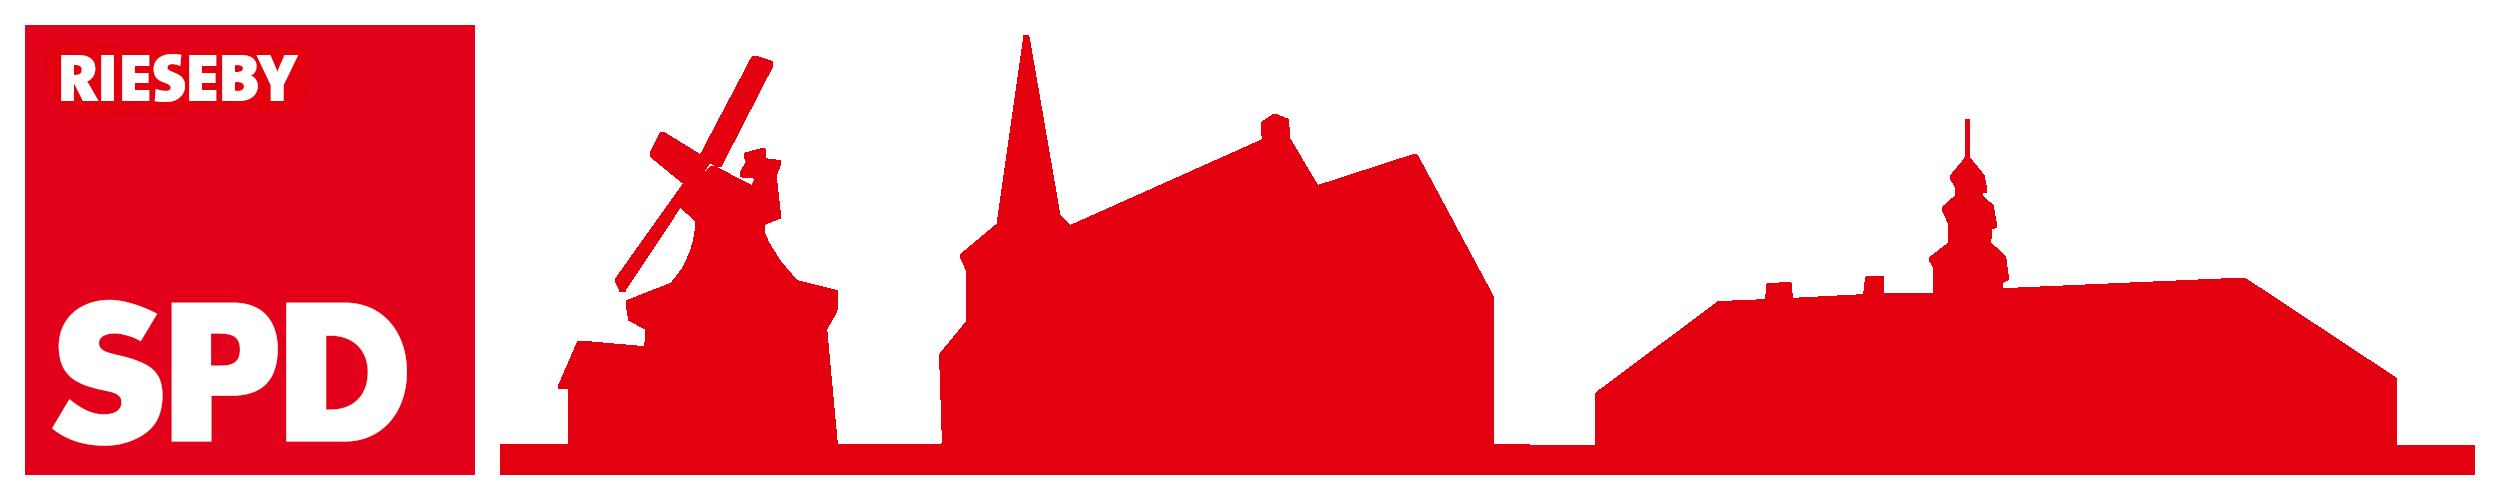 SPD Rieseby